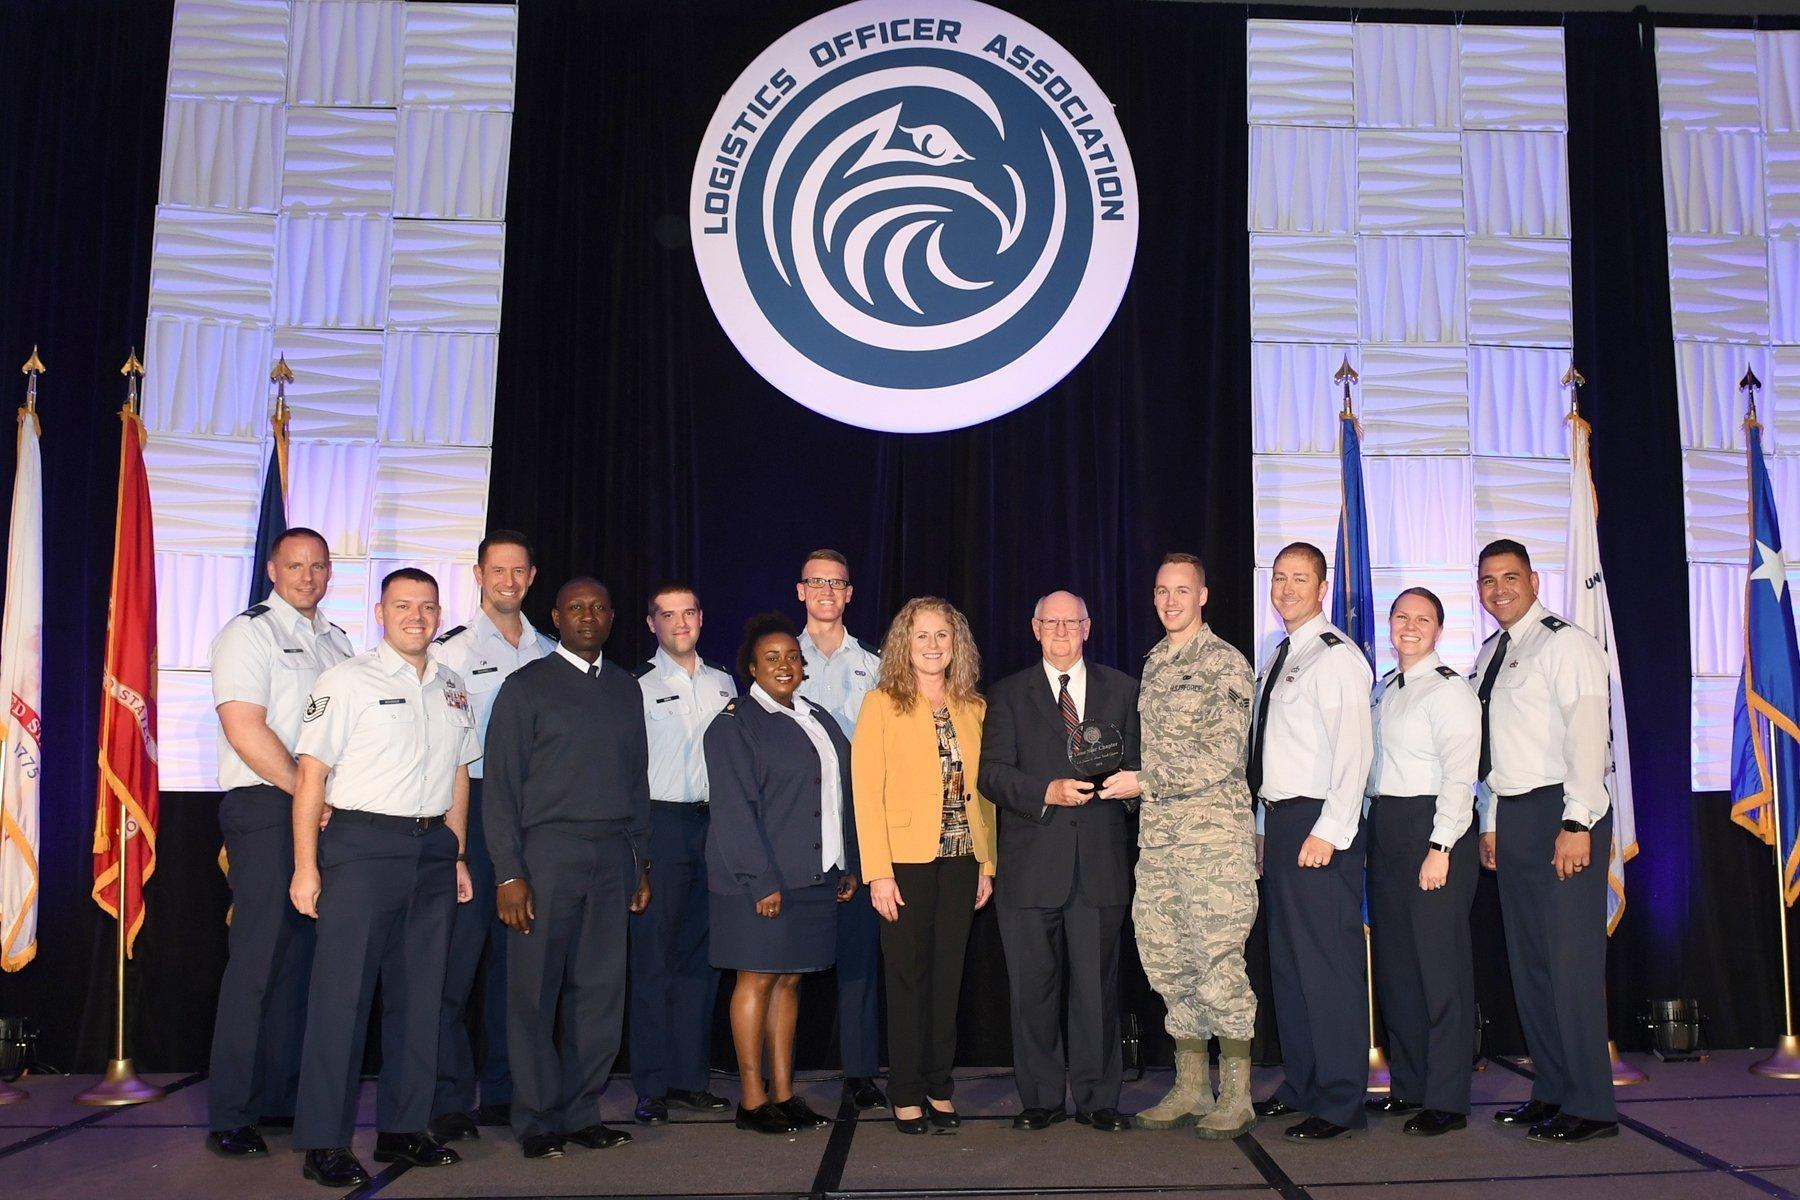 Awards - Logistics Officer Association